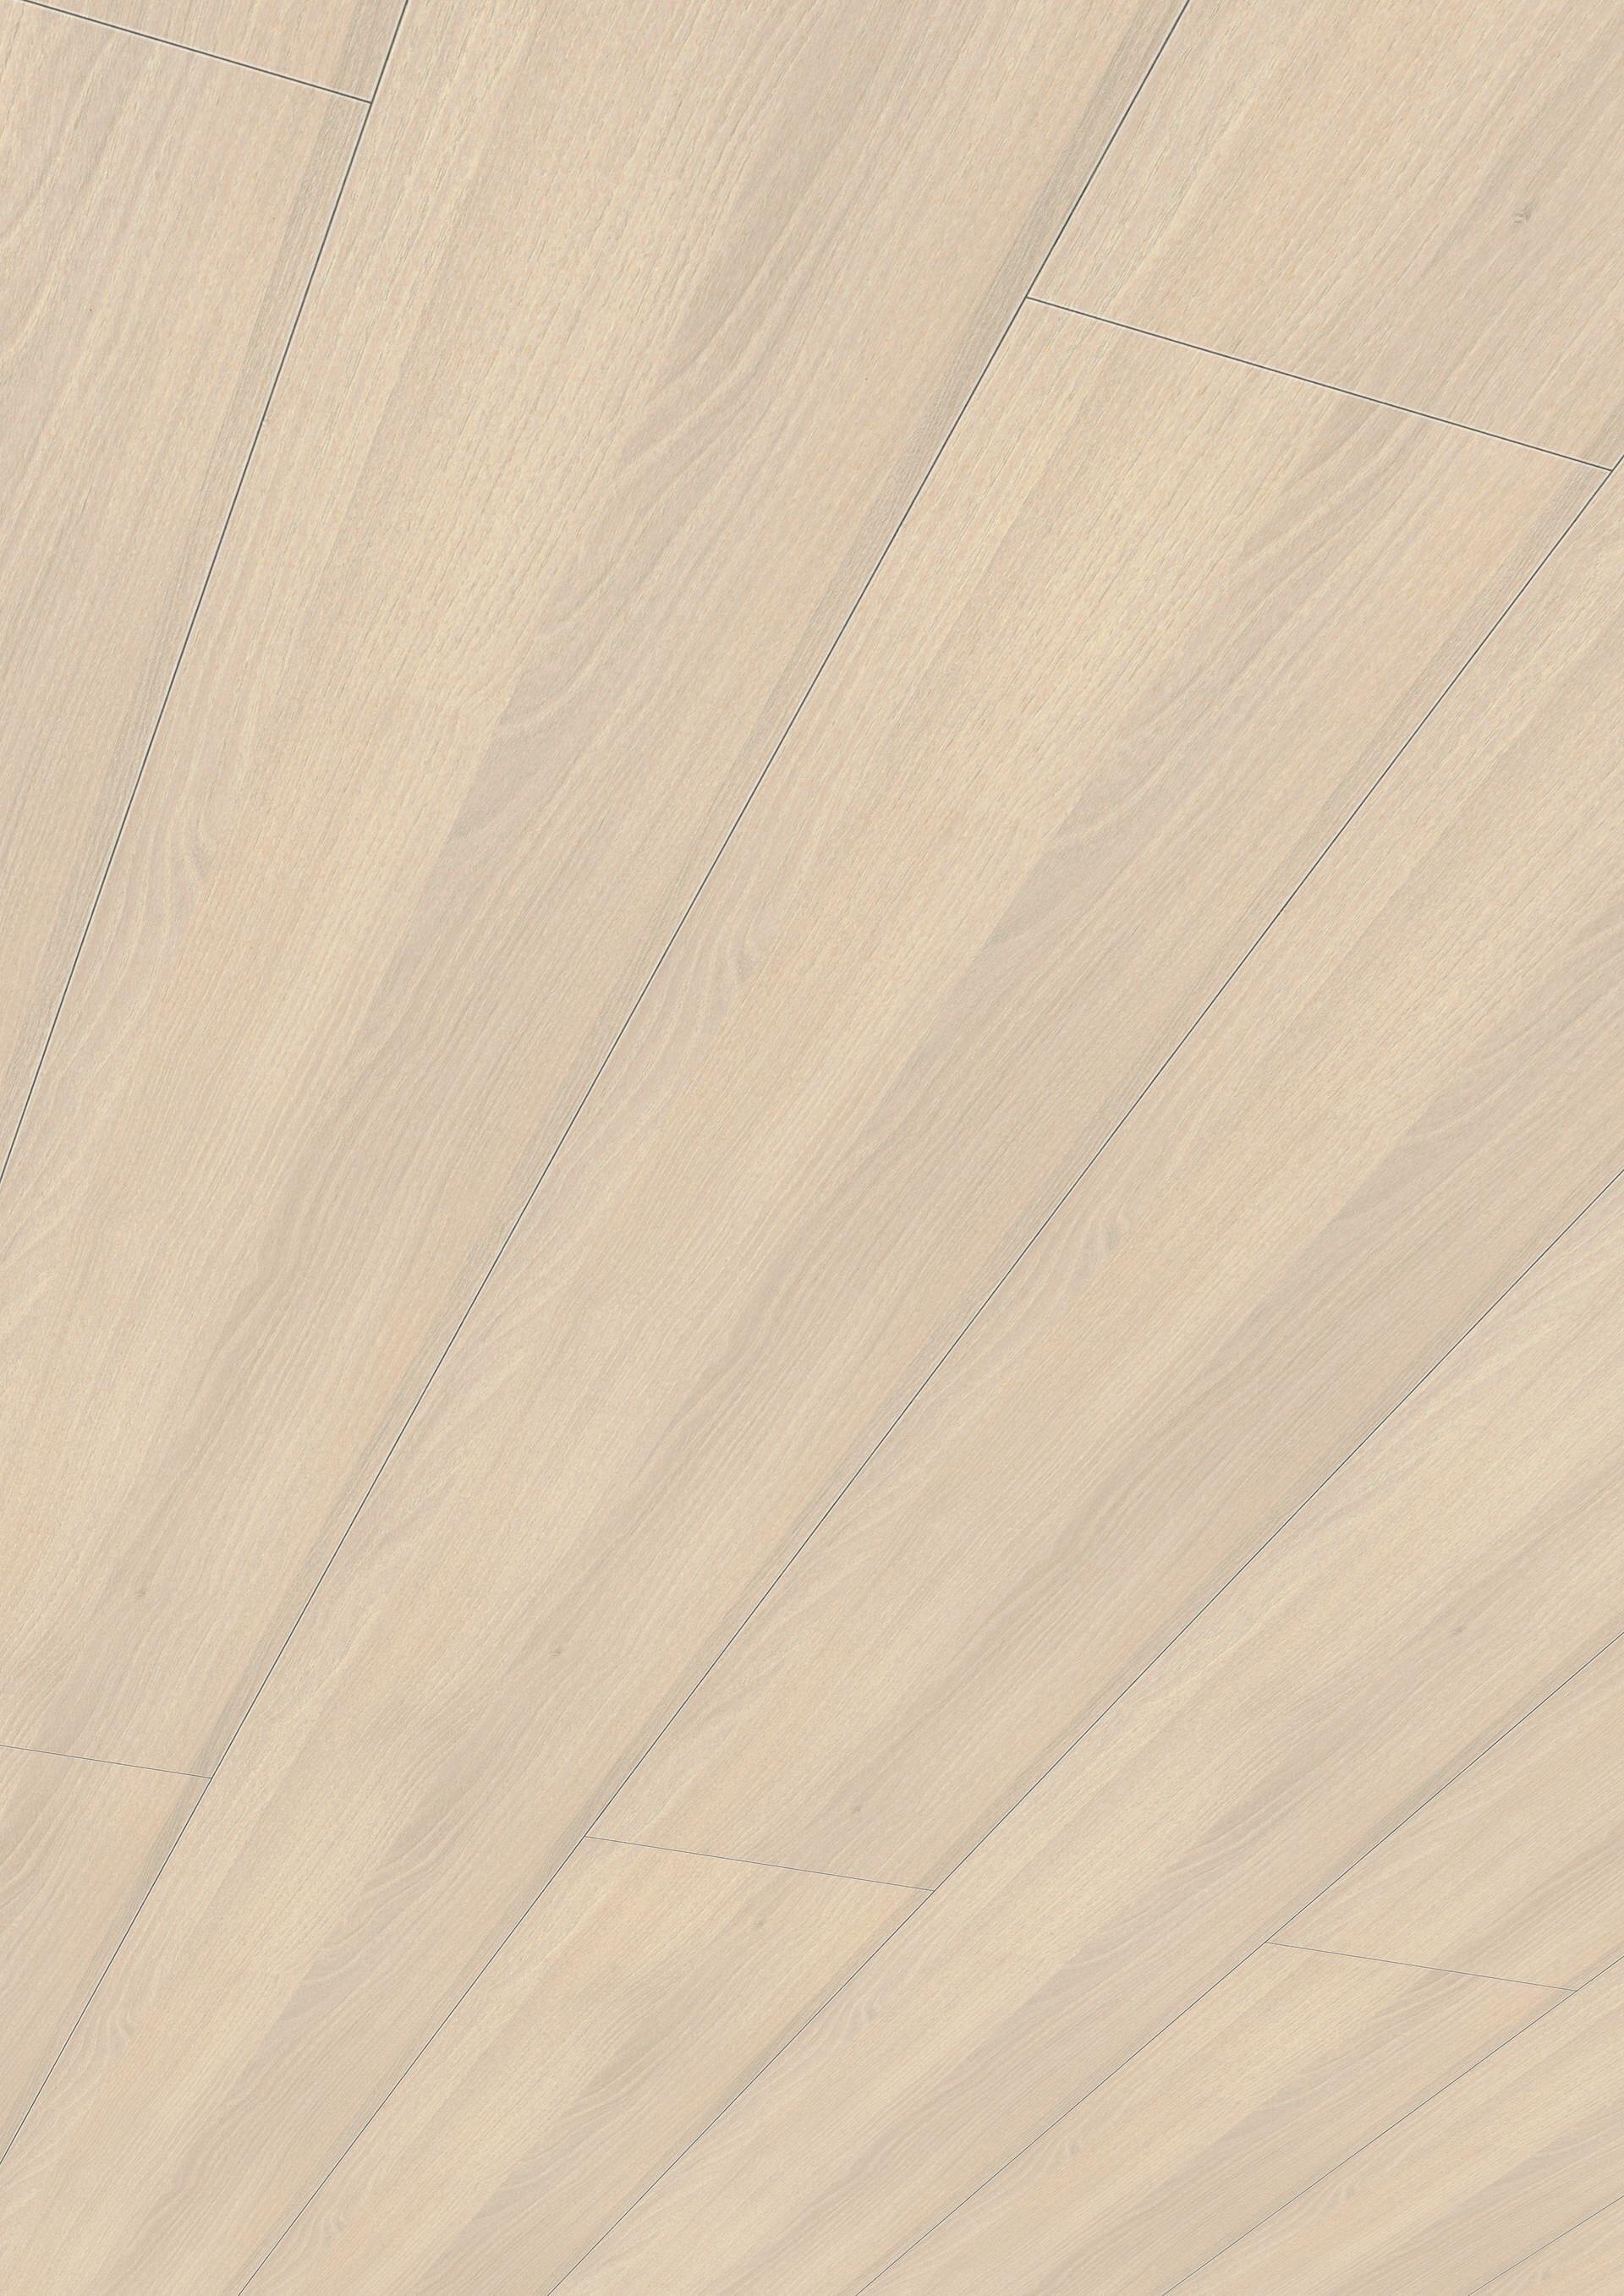 4012_Terra_DP250_Perspektive.jpg